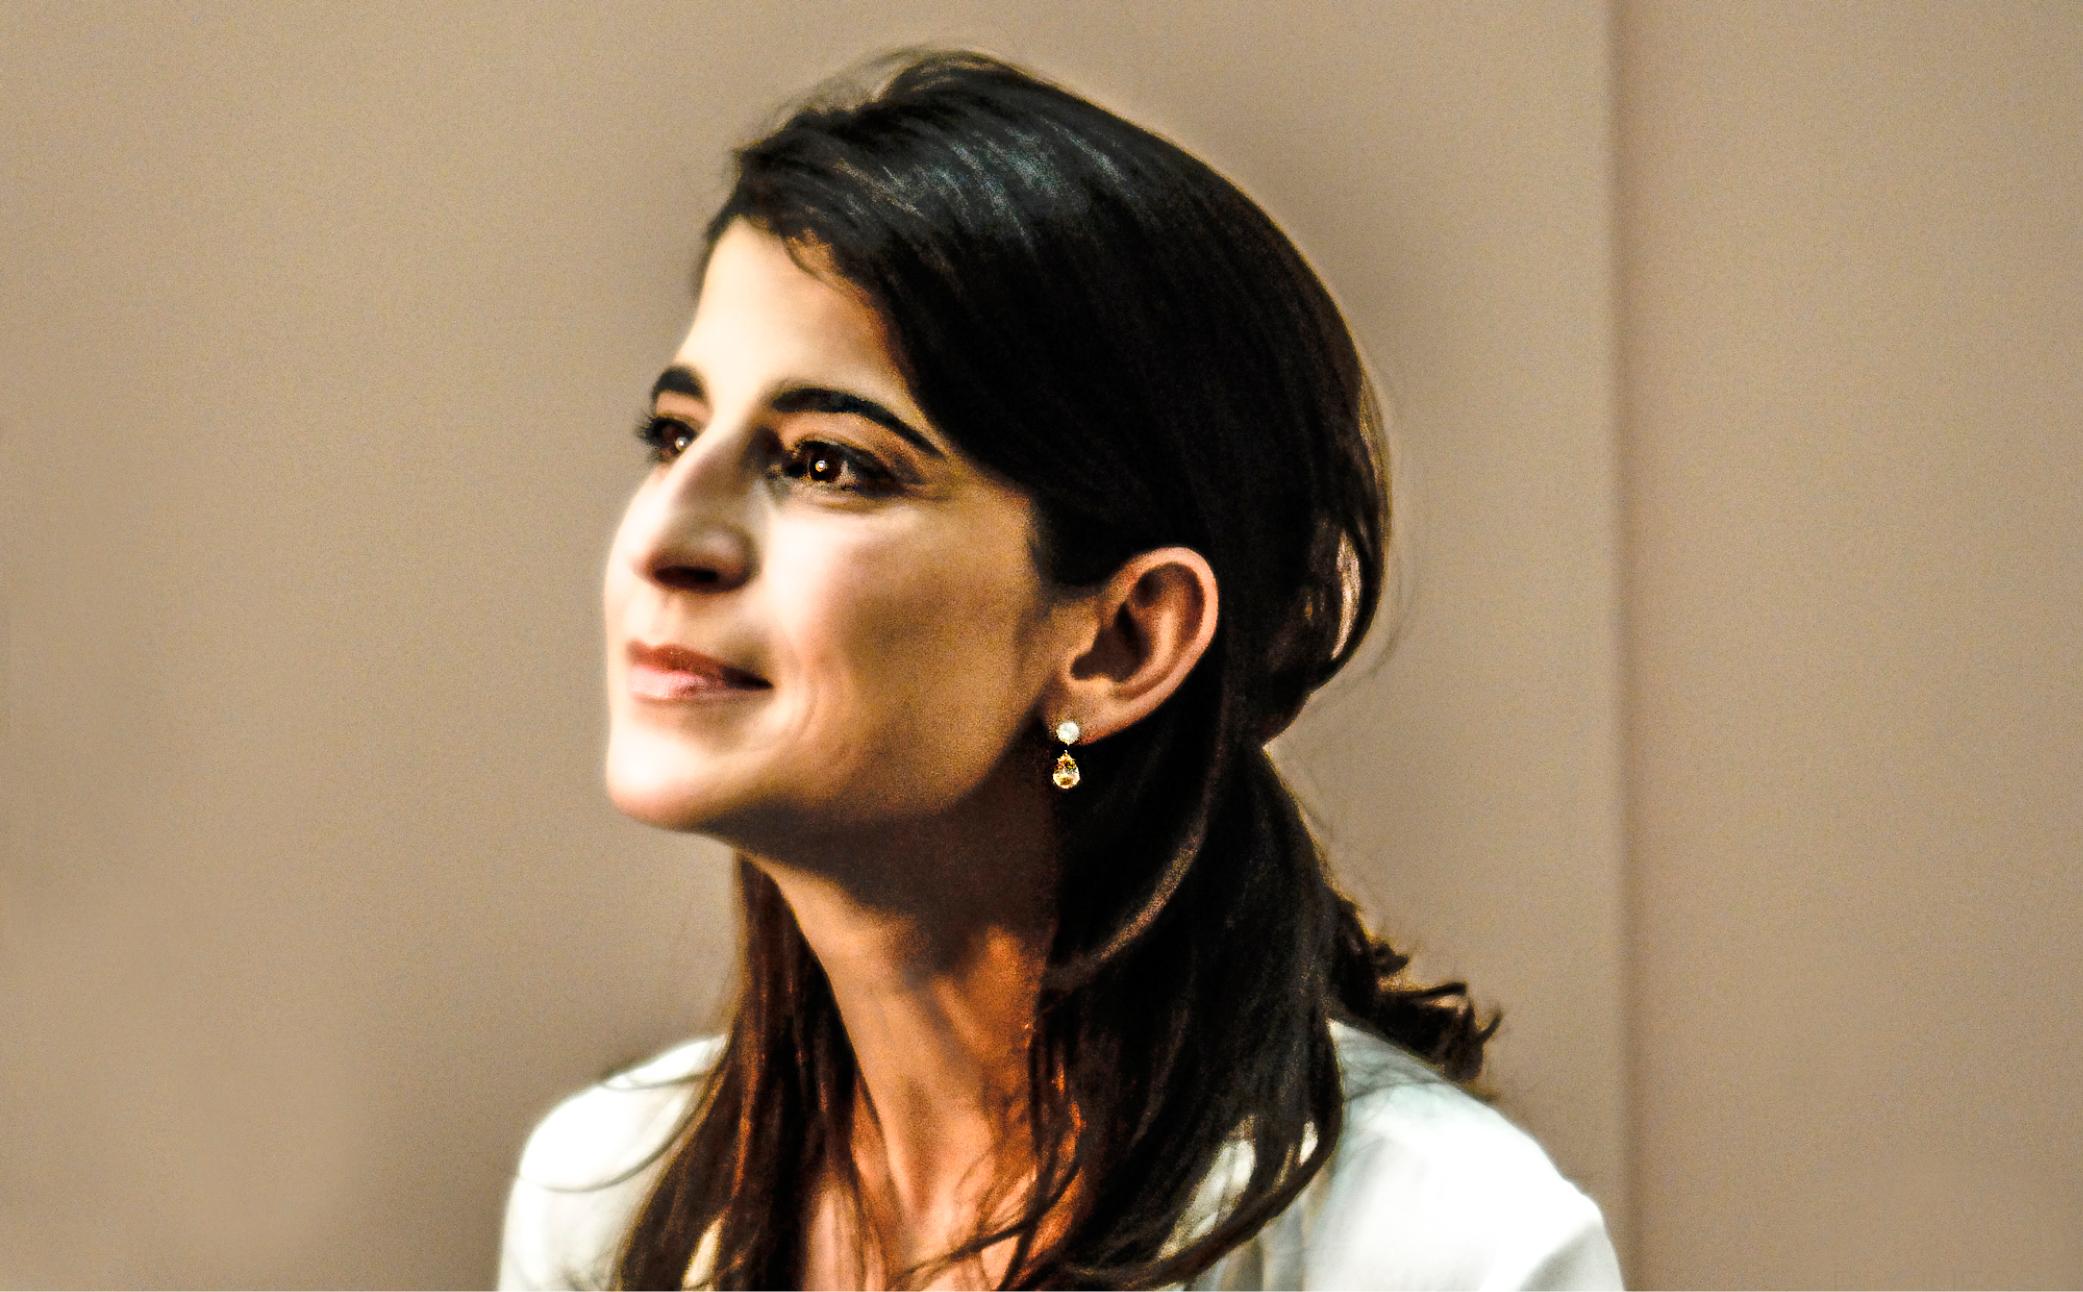 Frau auf einem Business Foto - Business Portraits - Business BrandingFotograf Berlin